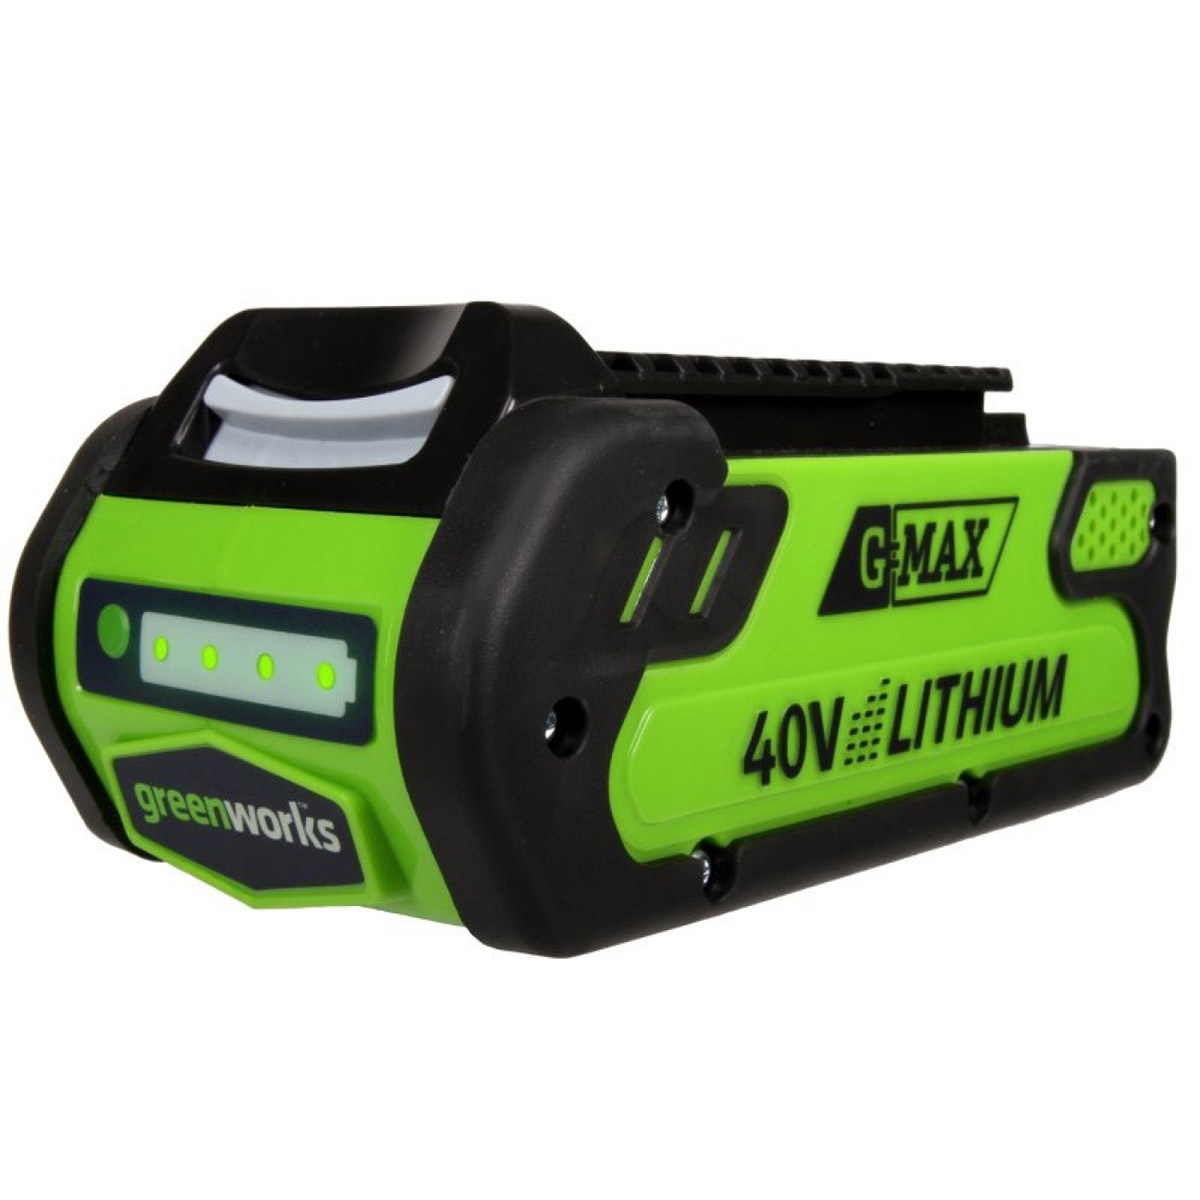 Аккумулятор для инструмента Greenworks G40B2 40V, 2 А.ч пильная цепь greenworks 40v 40 см